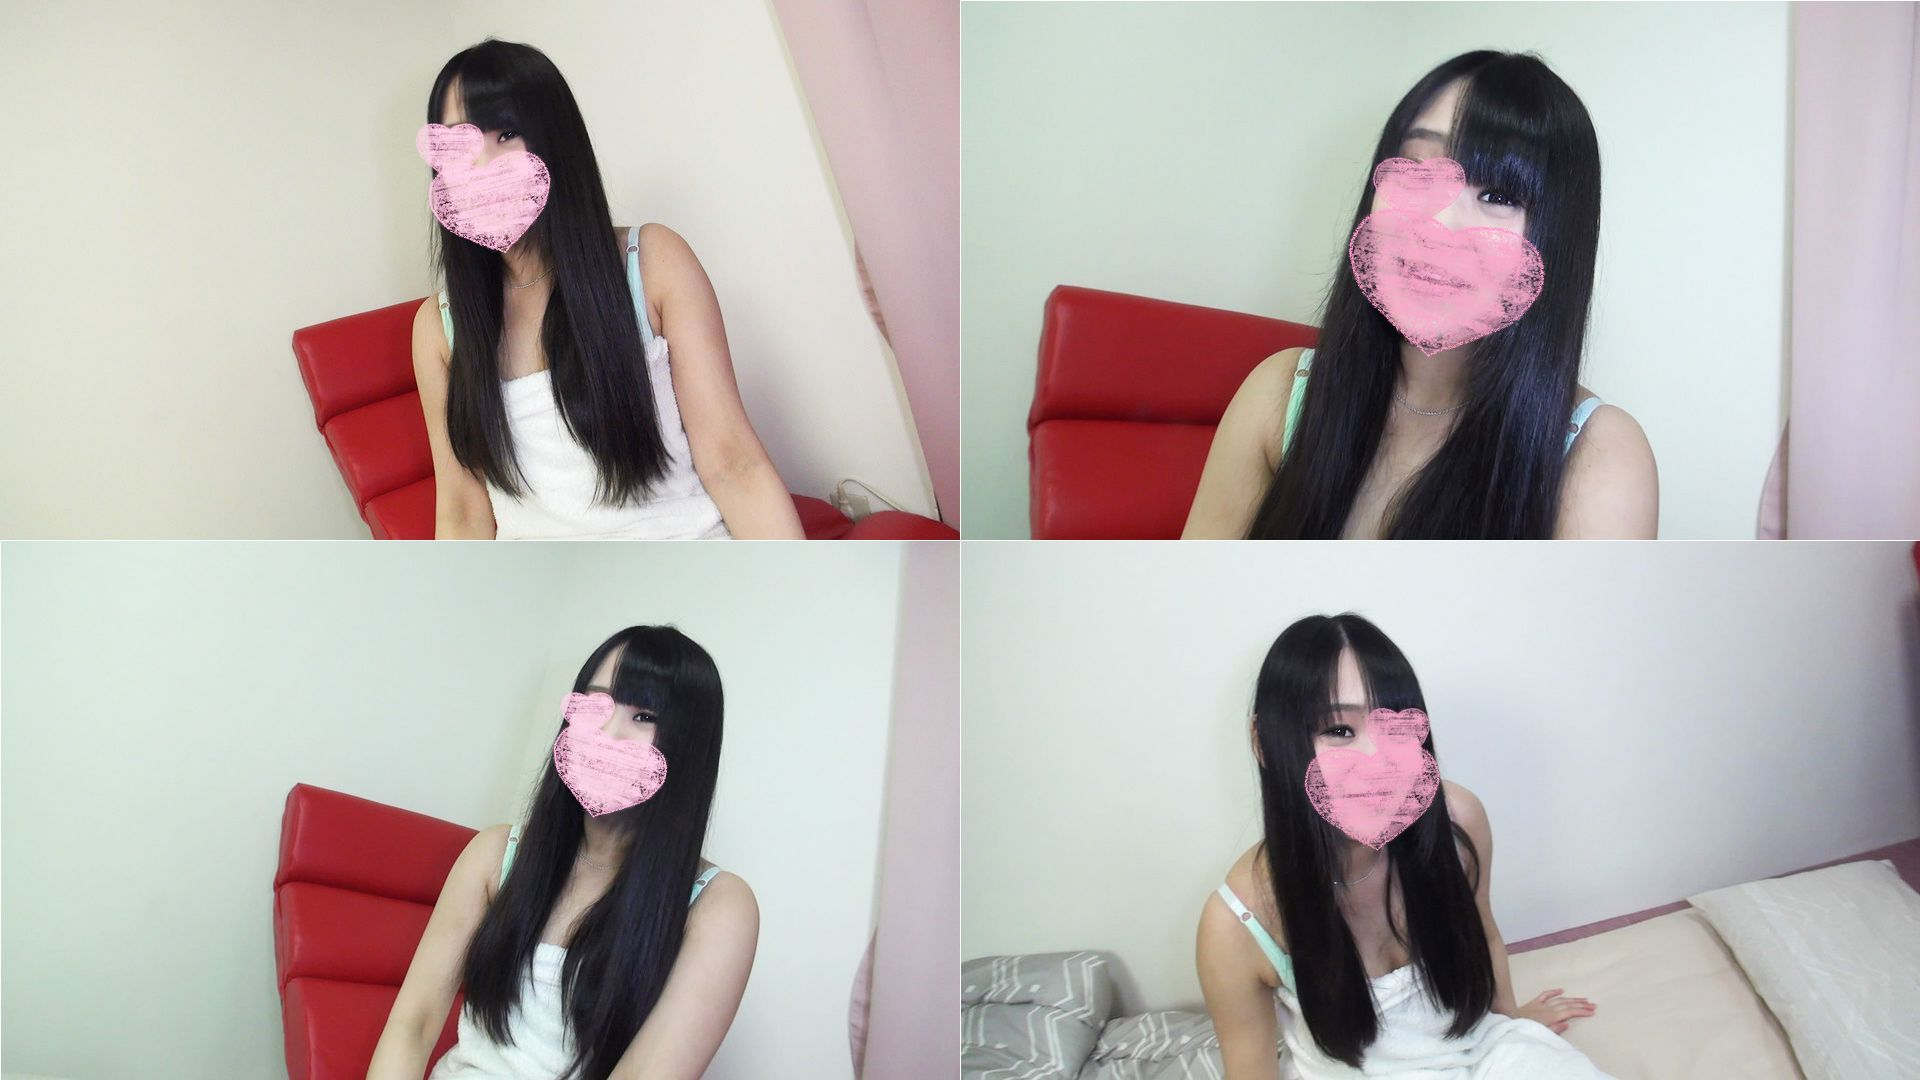 FC2 PPV 417069 Black hair Long 170 cm tall girl's squirting guchogchu pussy creampie! 【selfie】